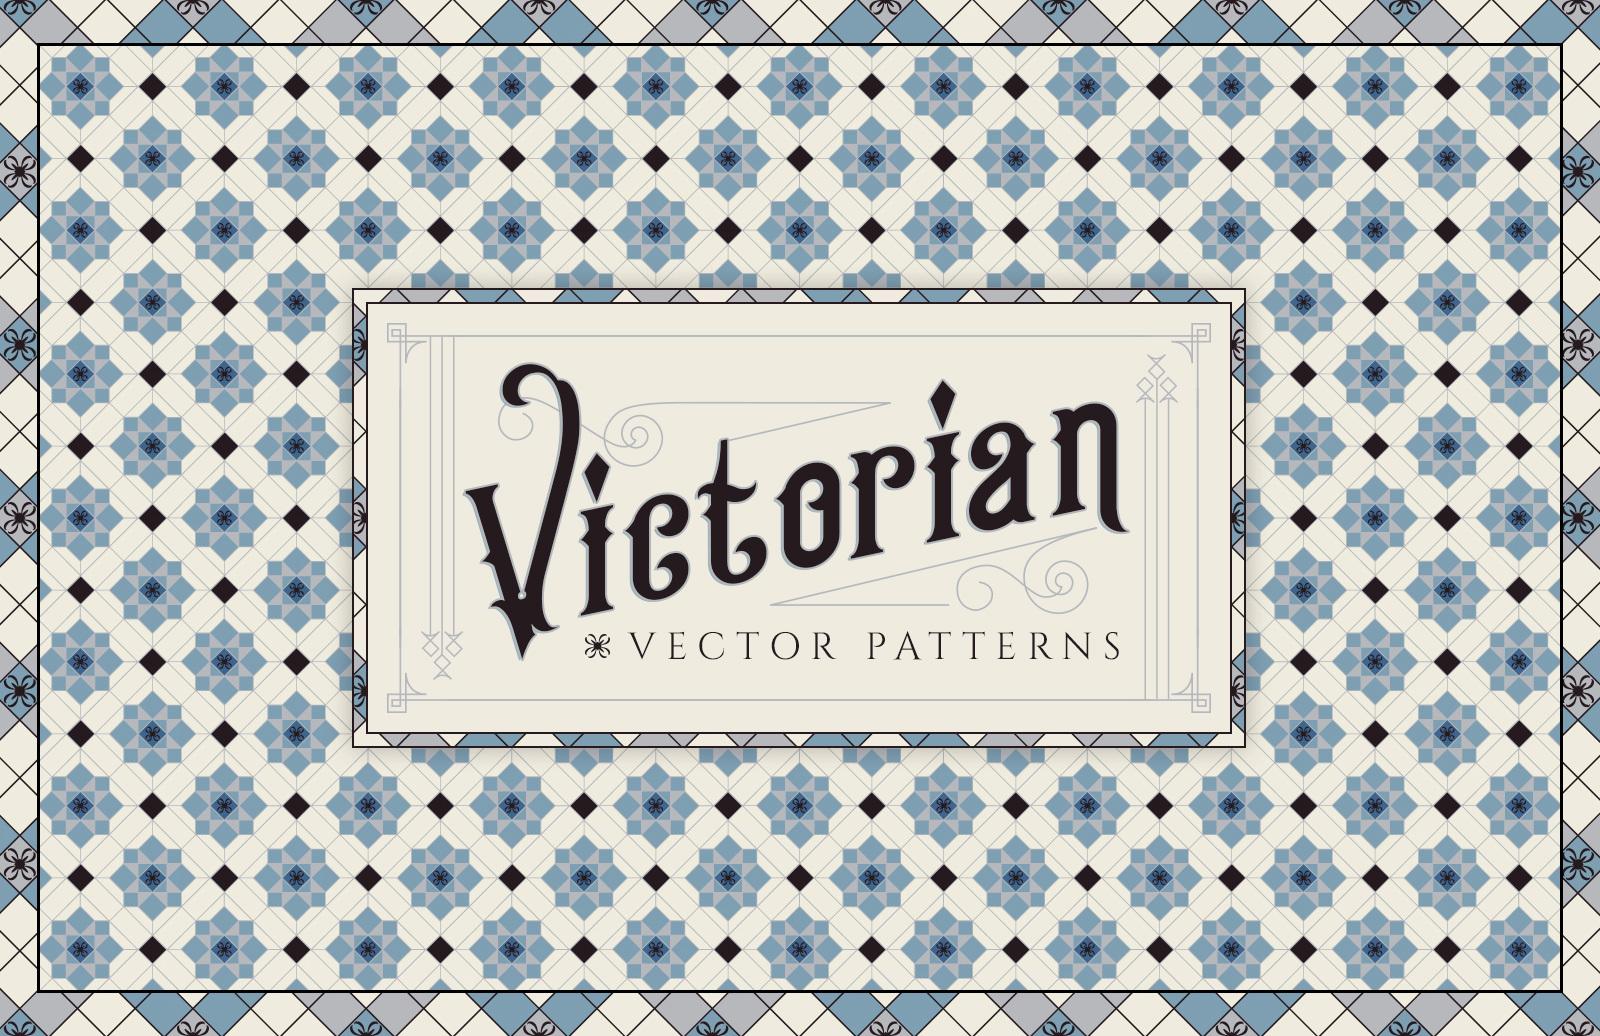 Victorian Vector Patterns